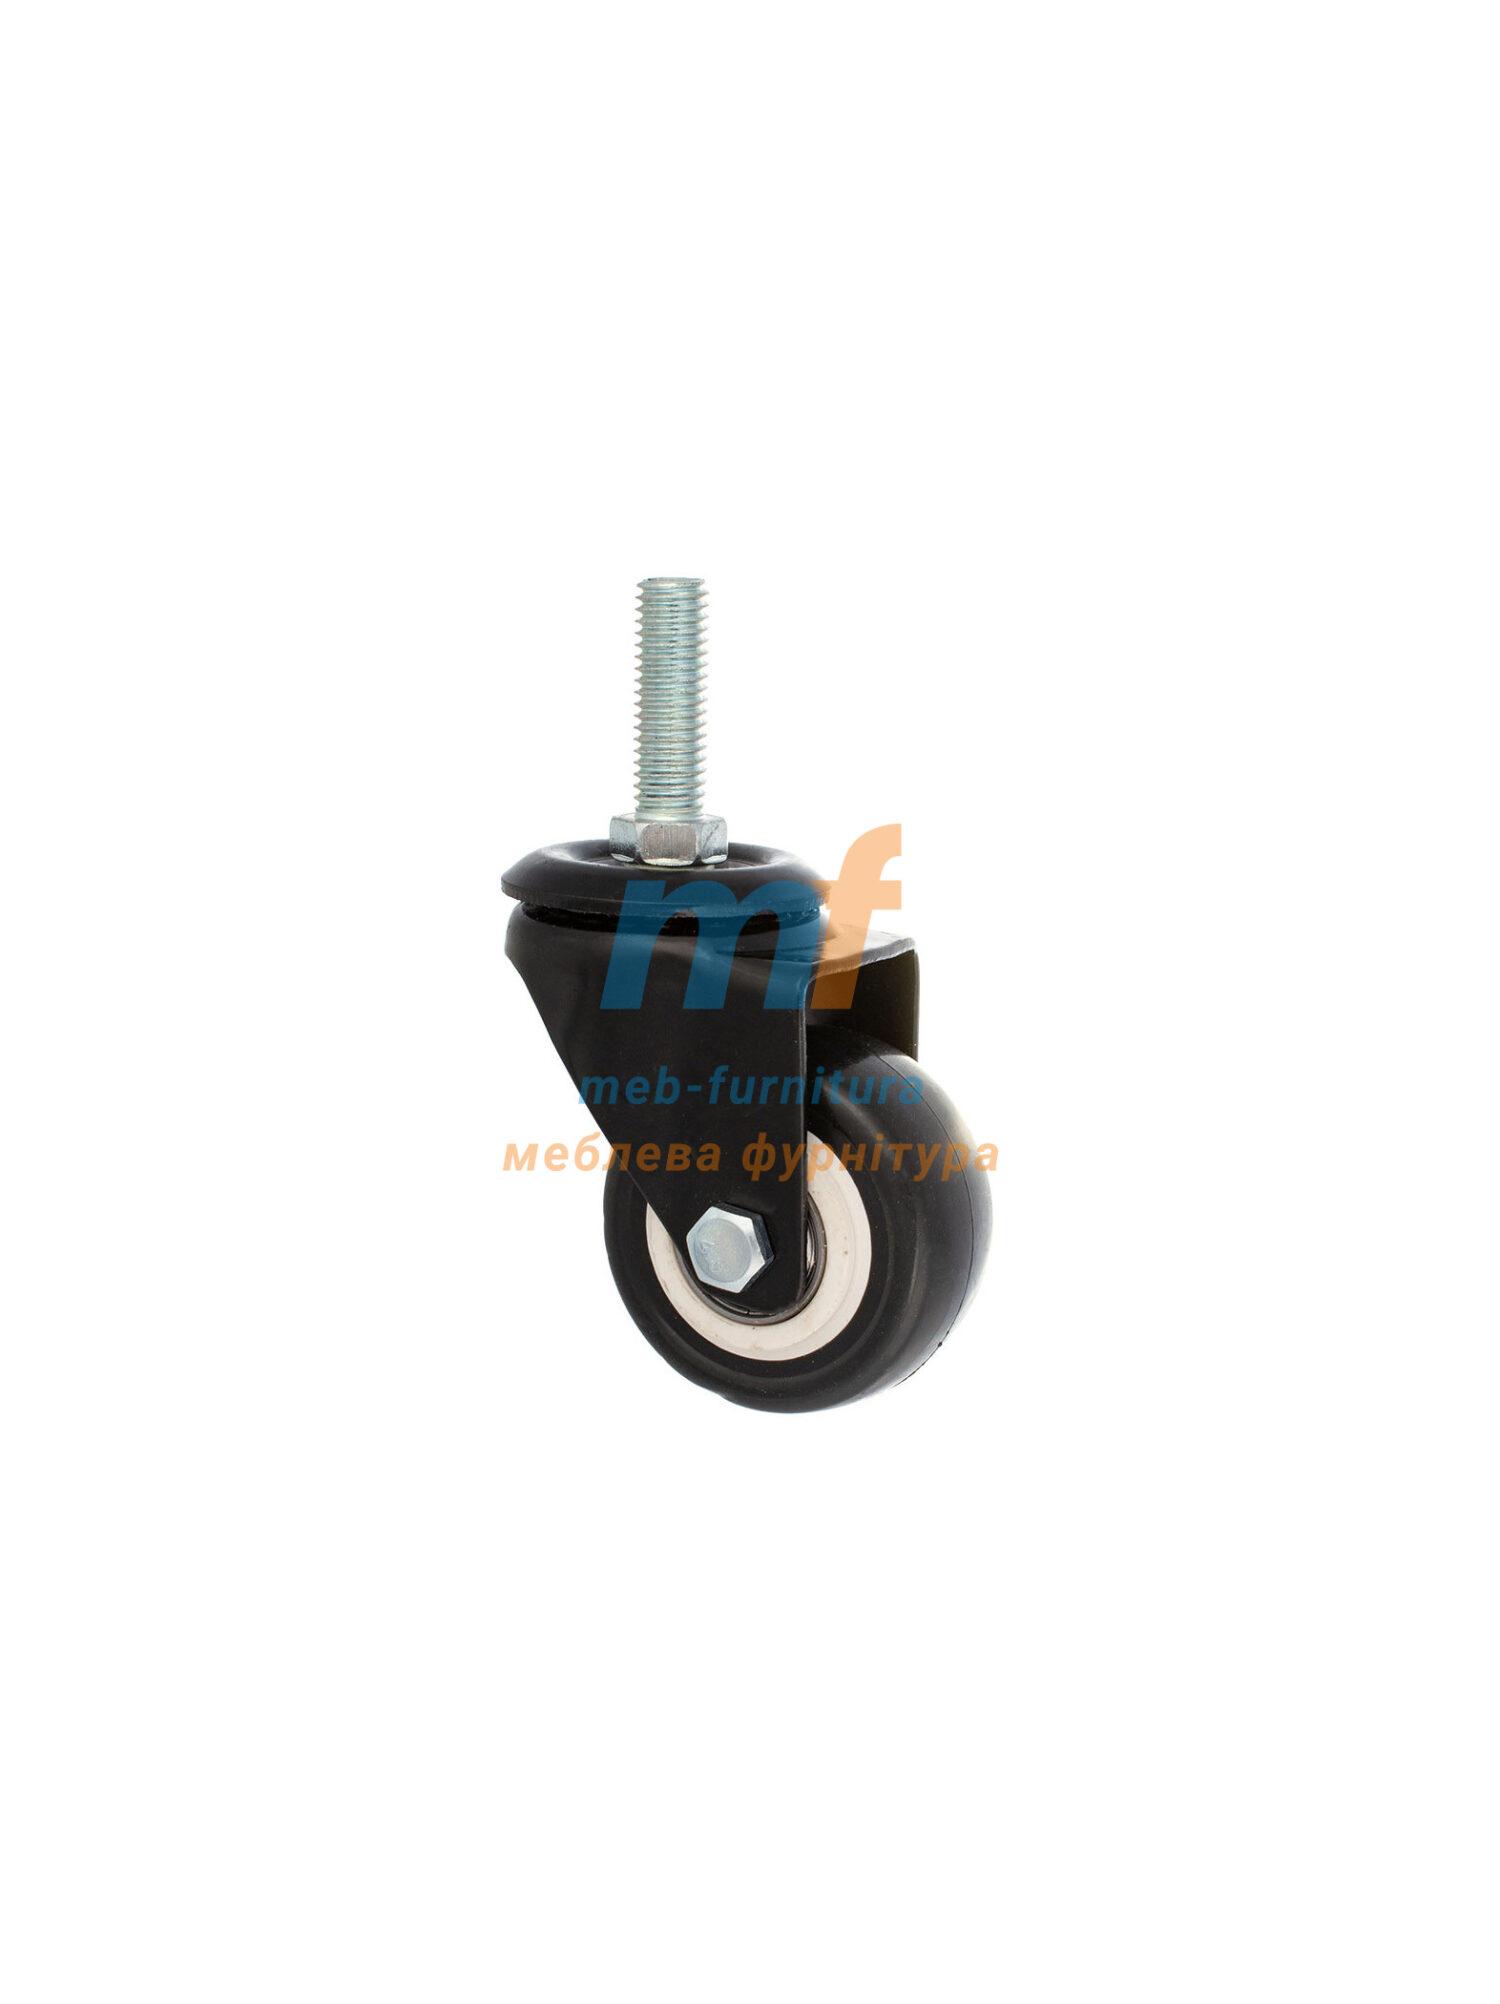 Колесо резина с резьбой М10 50мм (3-001)